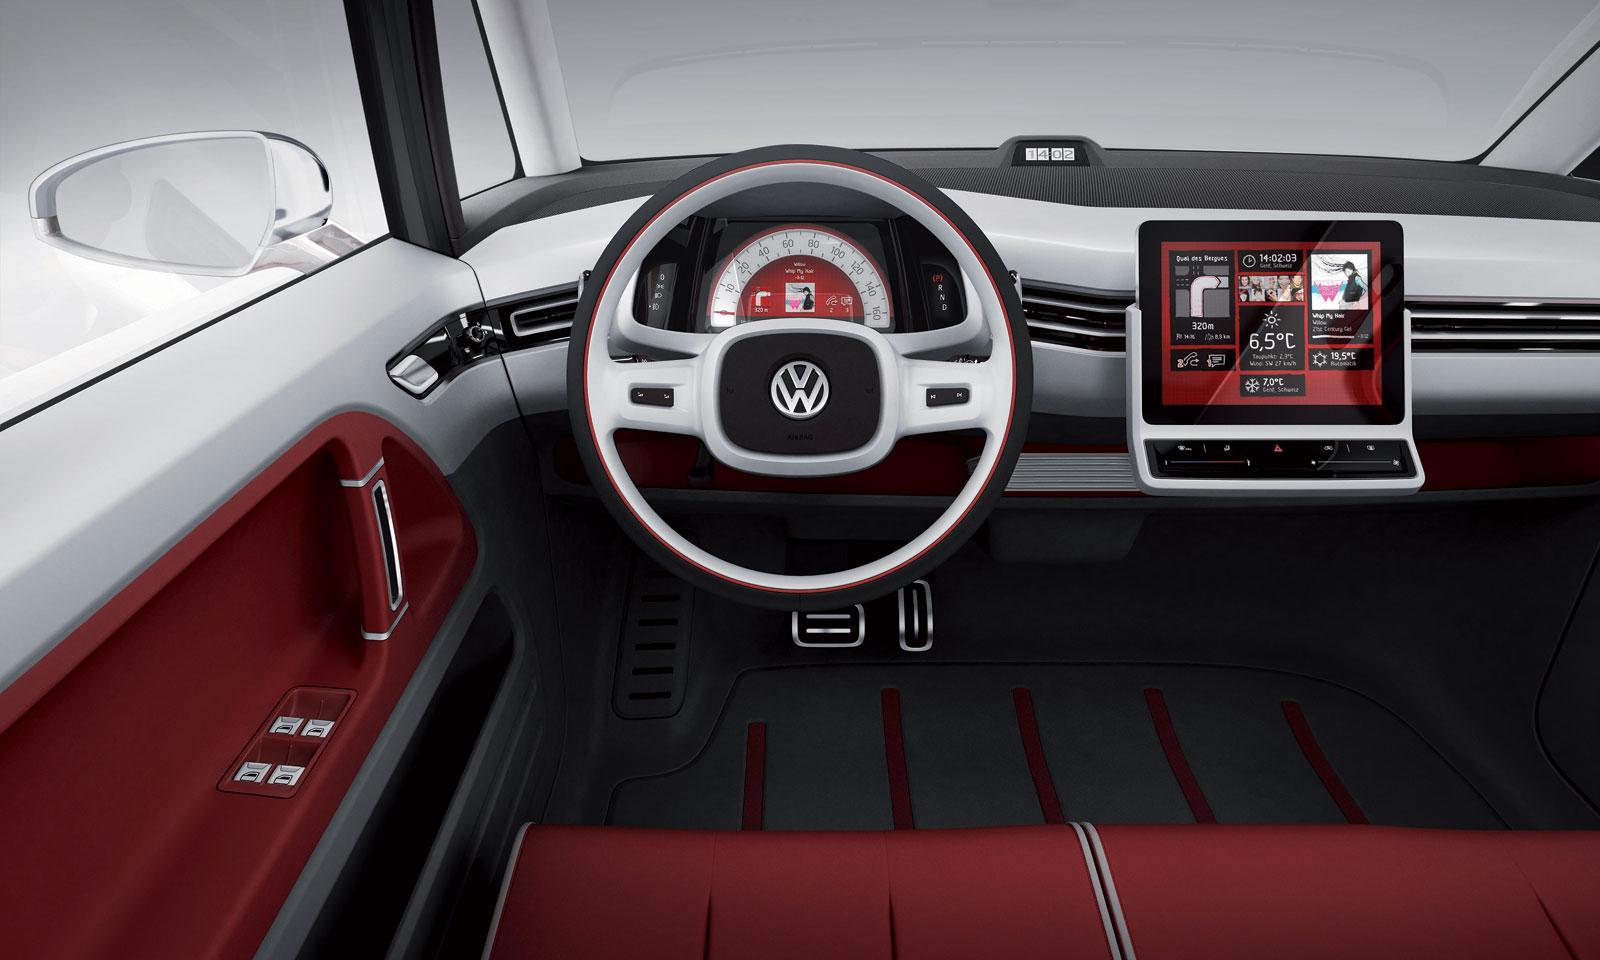 http://1.bp.blogspot.com/-crrbsgzOHm0/T-N6JHZMHtI/AAAAAAAAD2k/VzSgcIp0OS8/s1600/Volkswagen+Bulli+Concept+Hd+Wallpapers+2011_6.jpg